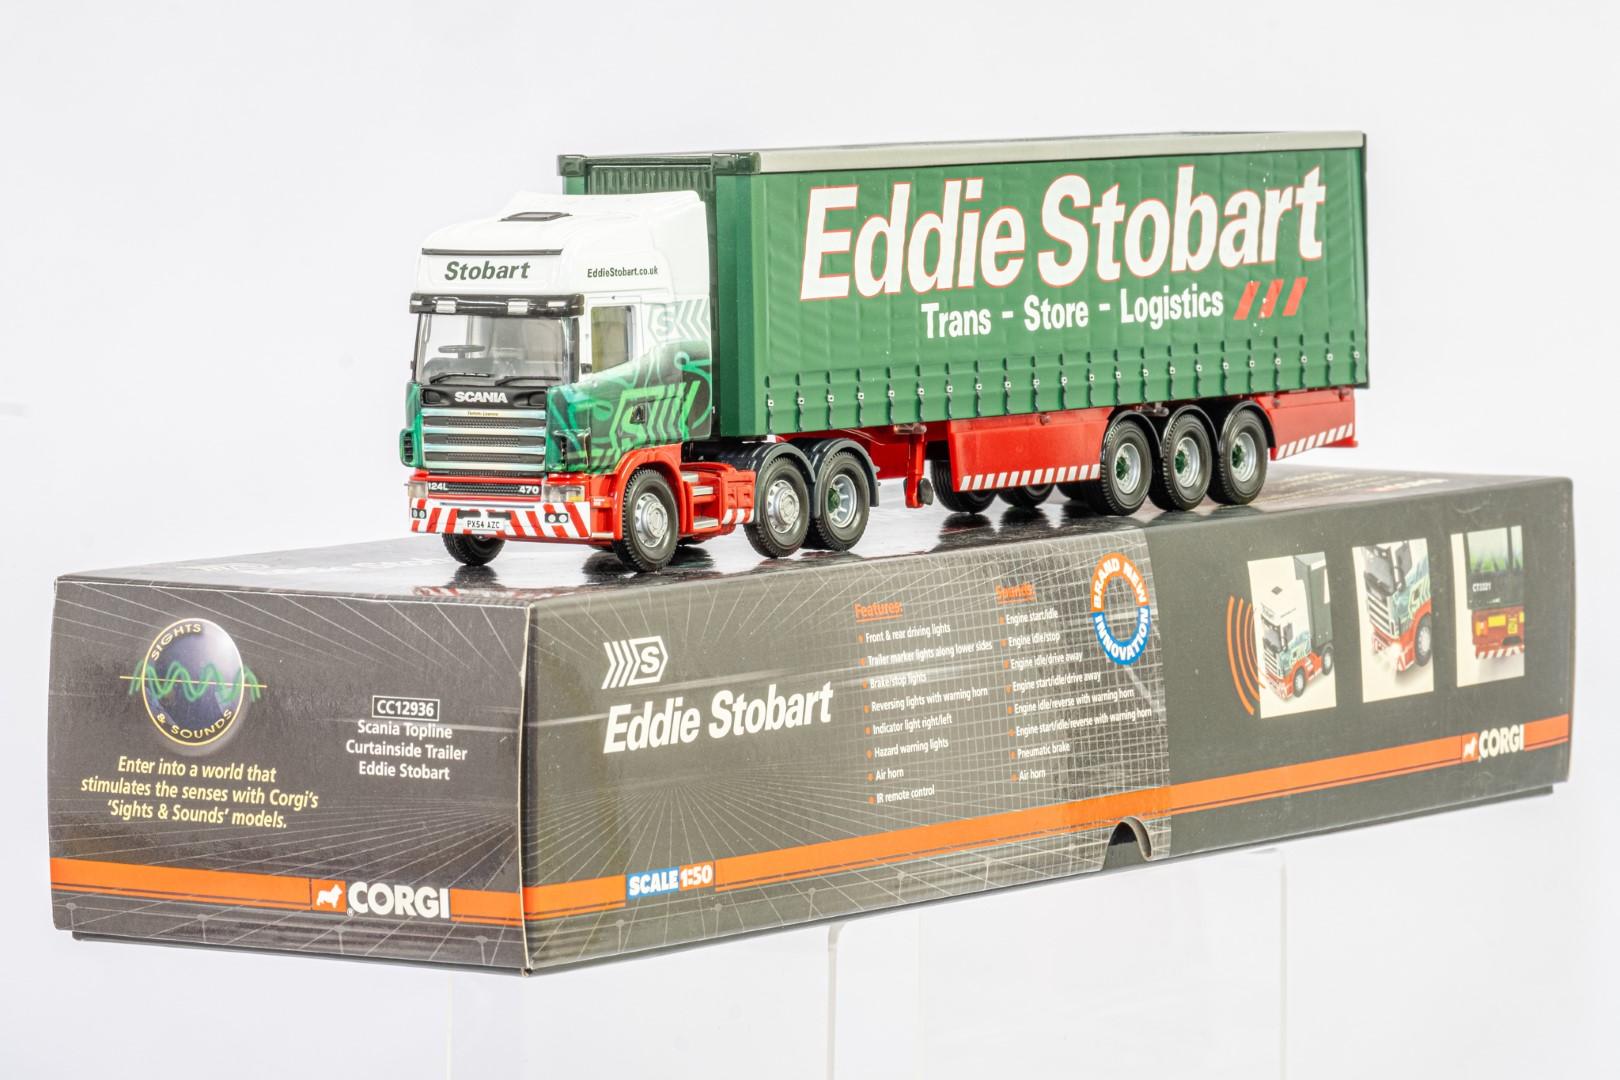 Corgi Scania Topline Curtainside Trailer - Eddie Stobart - Sights & Sounds - Image 2 of 3